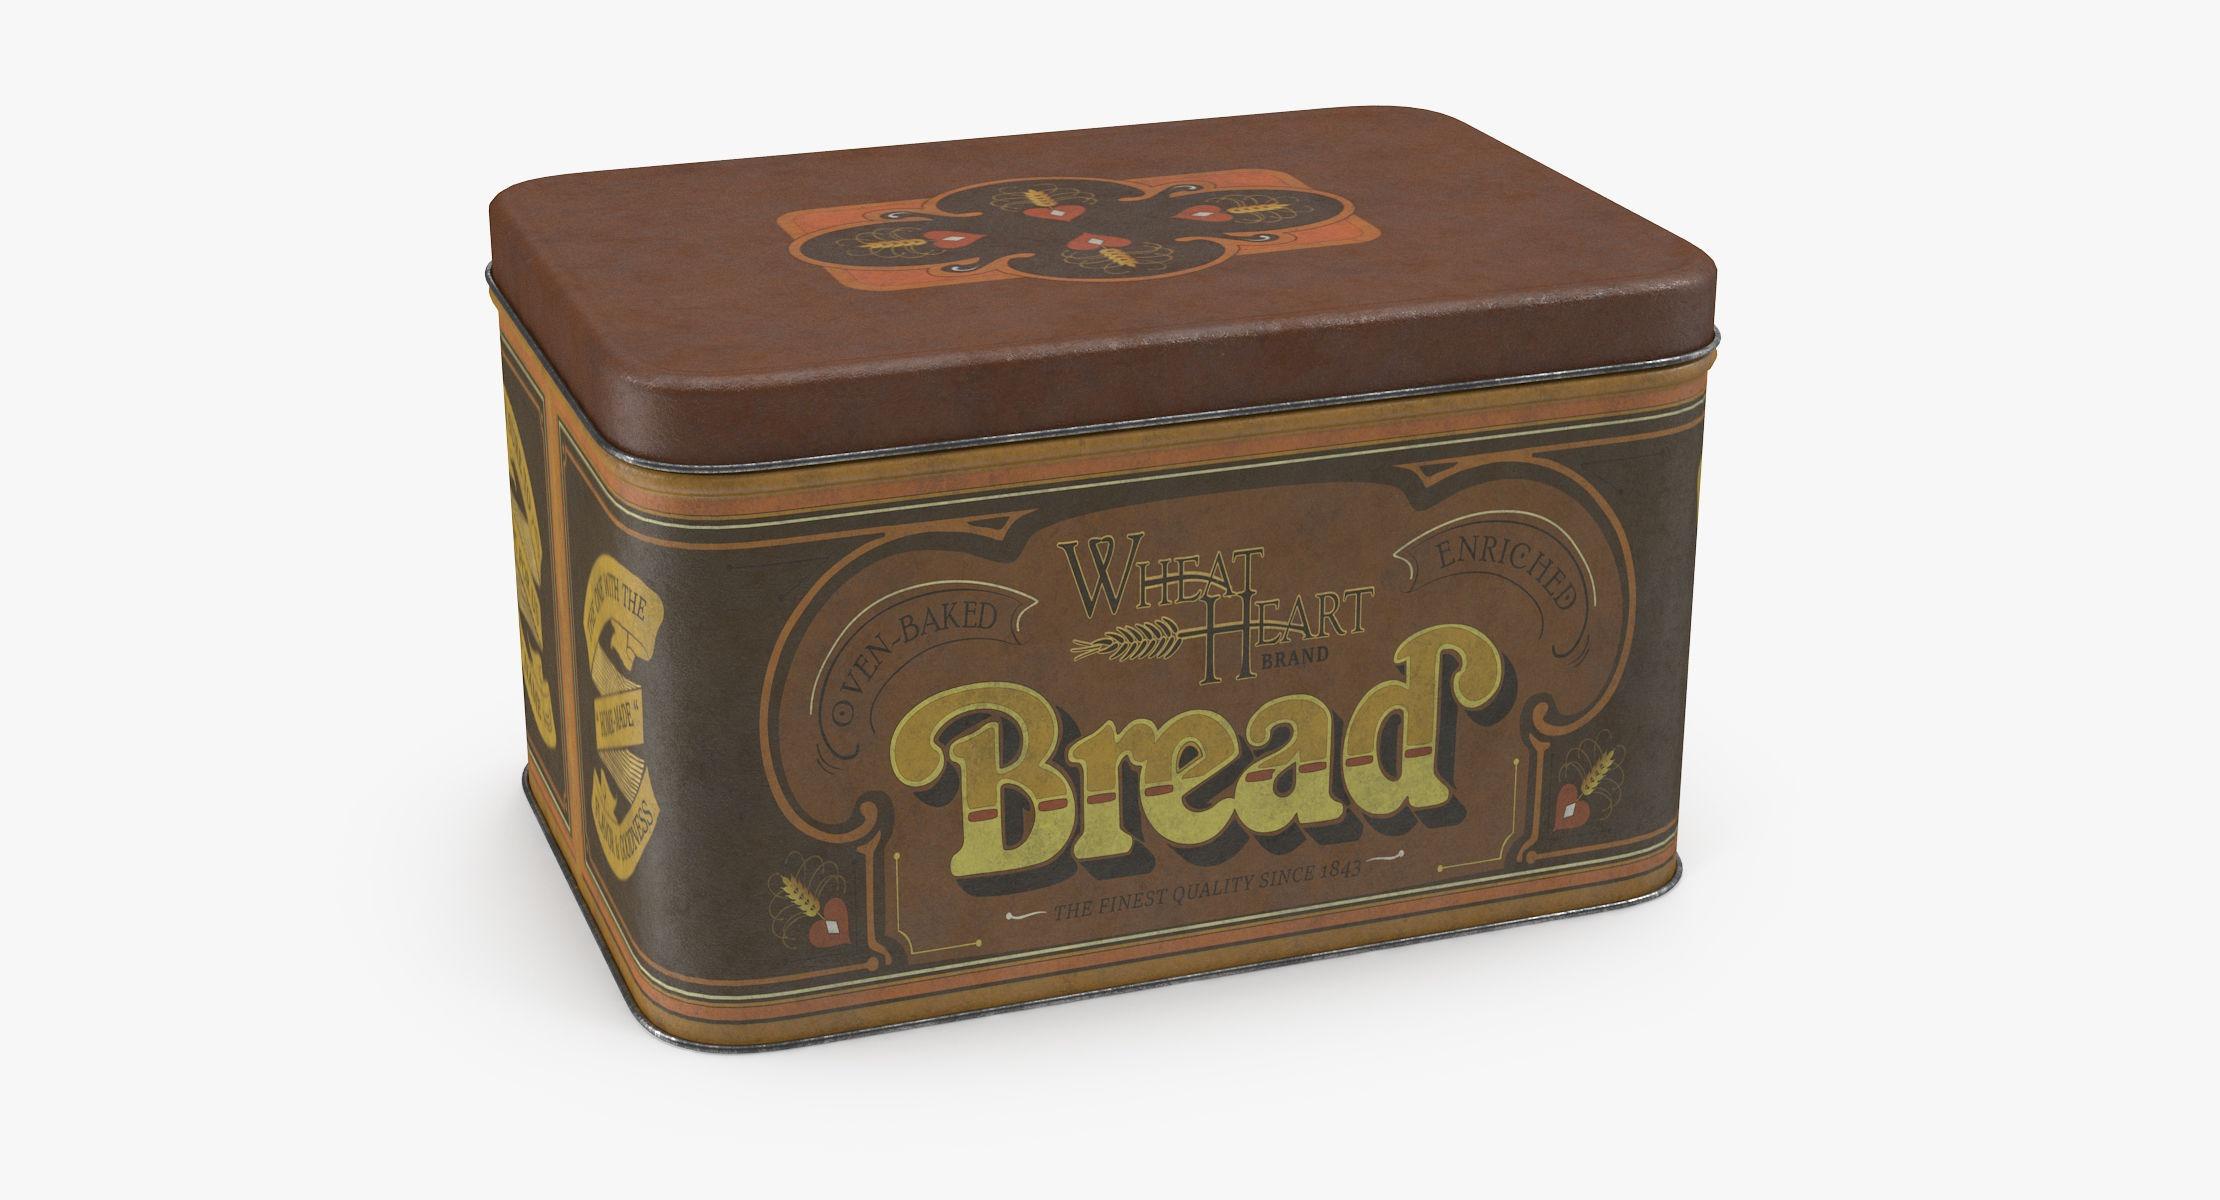 Vintage Metal Kitchen Tin Bread - reel 1